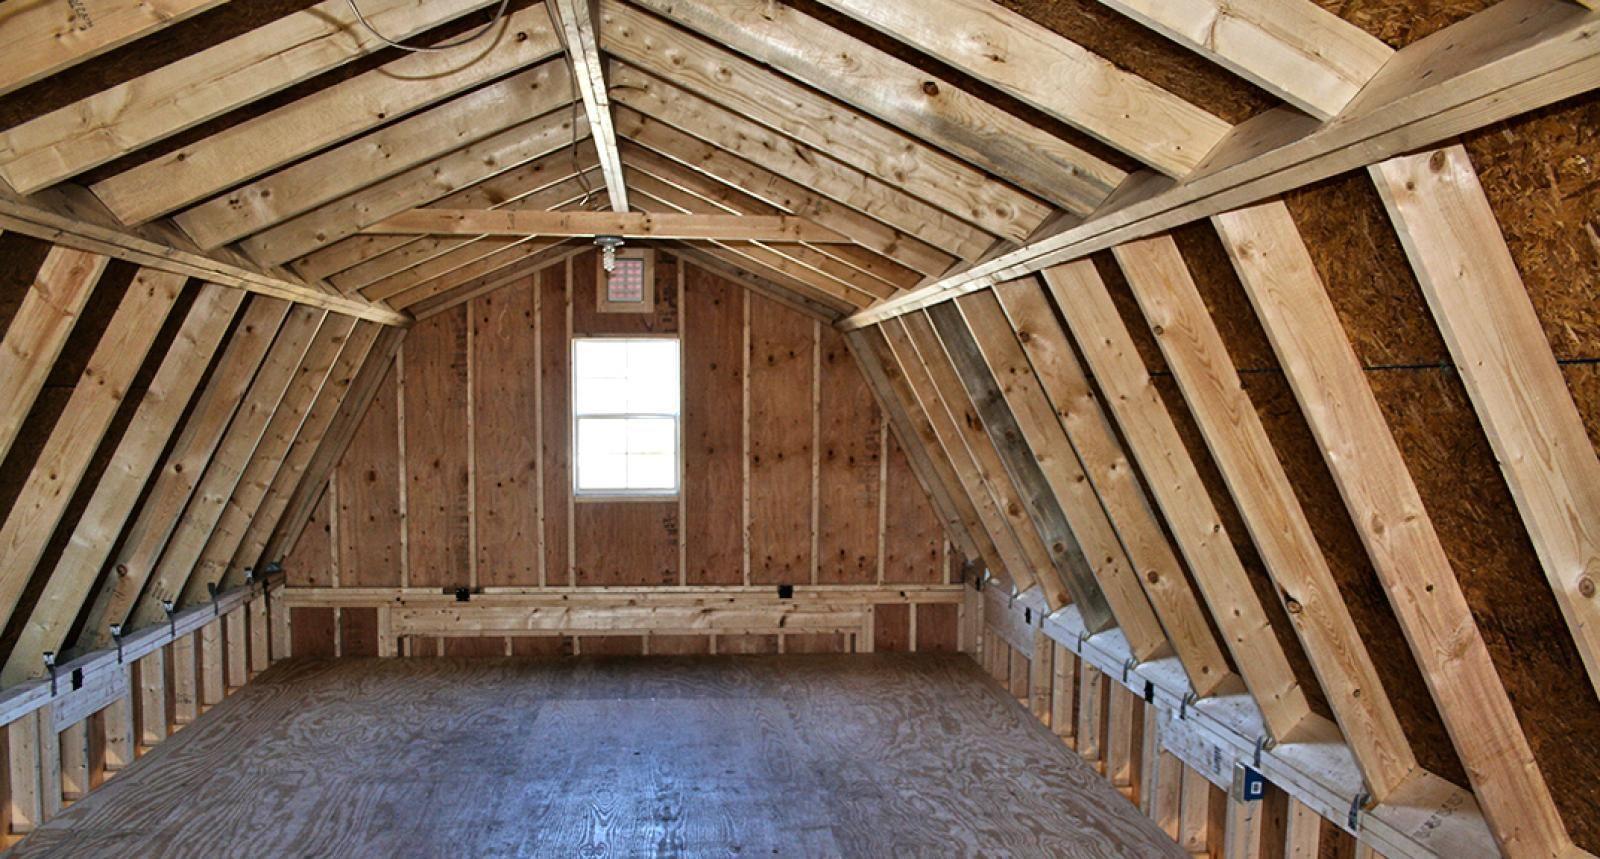 Gambrel Roof Framing Google Search Barns Amp Garage Plans Ideas In 2019 Gambrel Barn